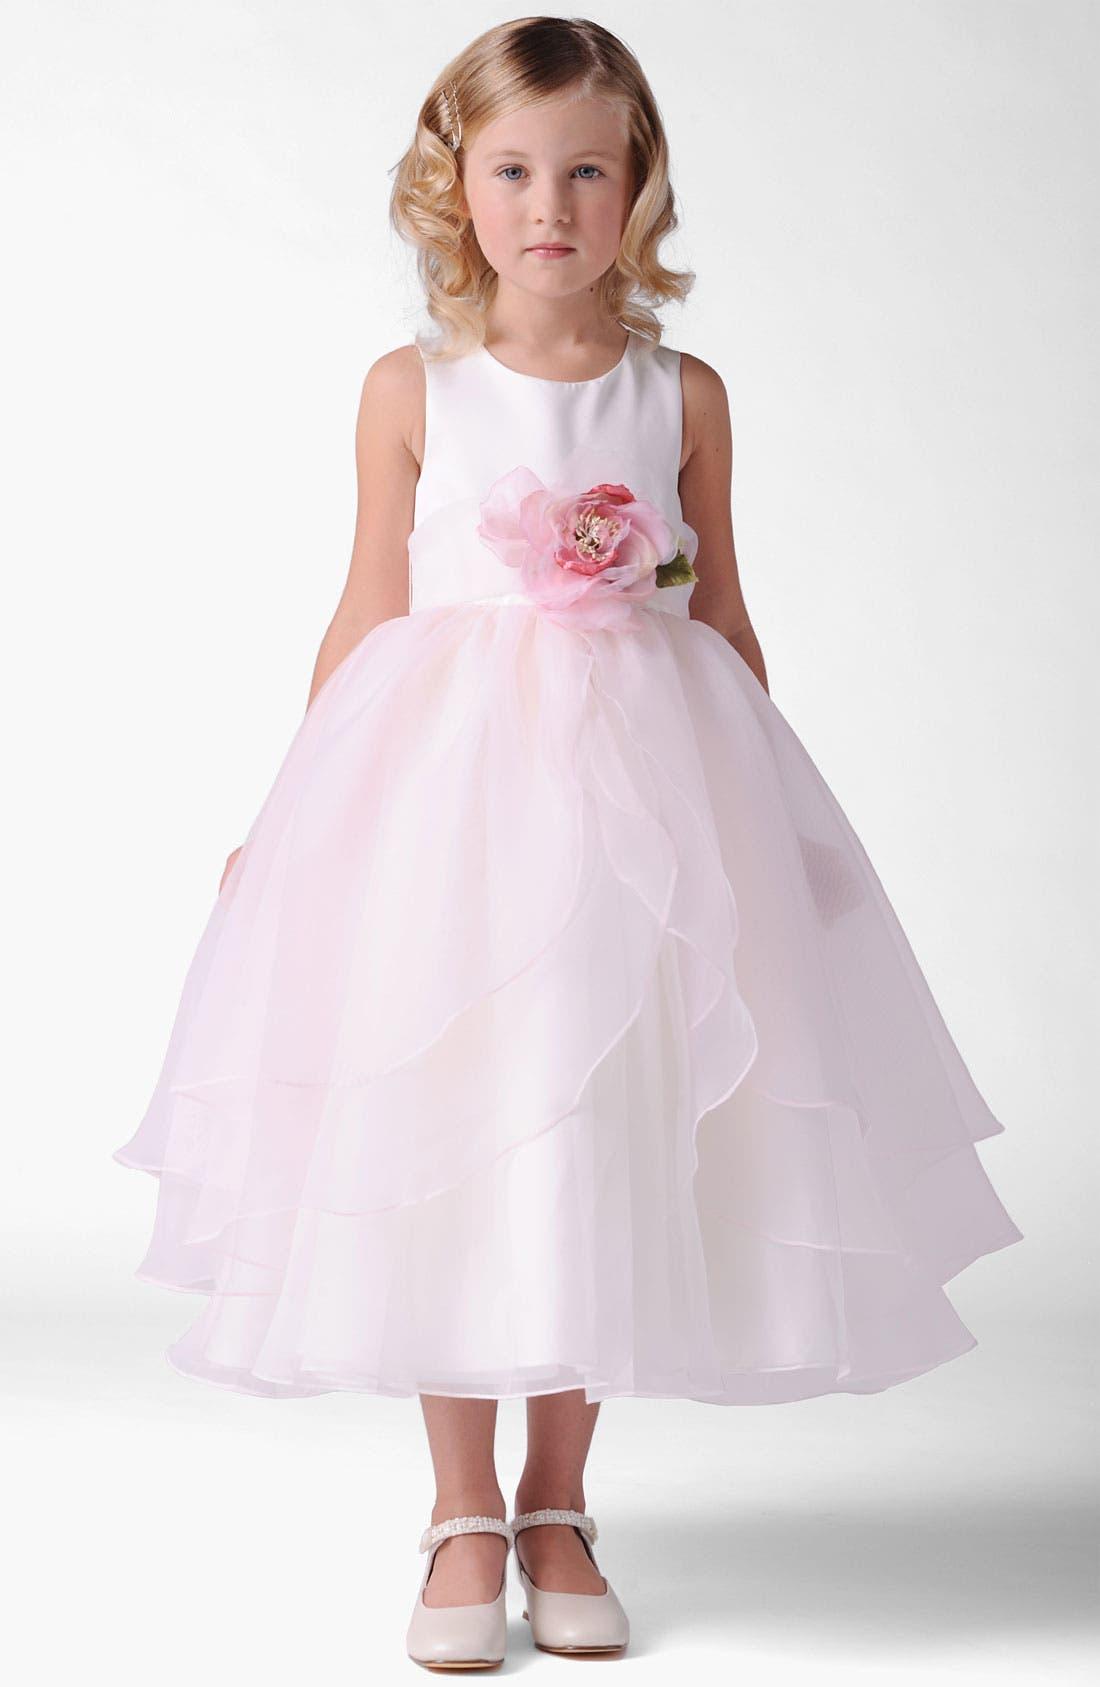 'Petal' Dress,                             Main thumbnail 1, color,                             IVORY/ BLUSH PINK